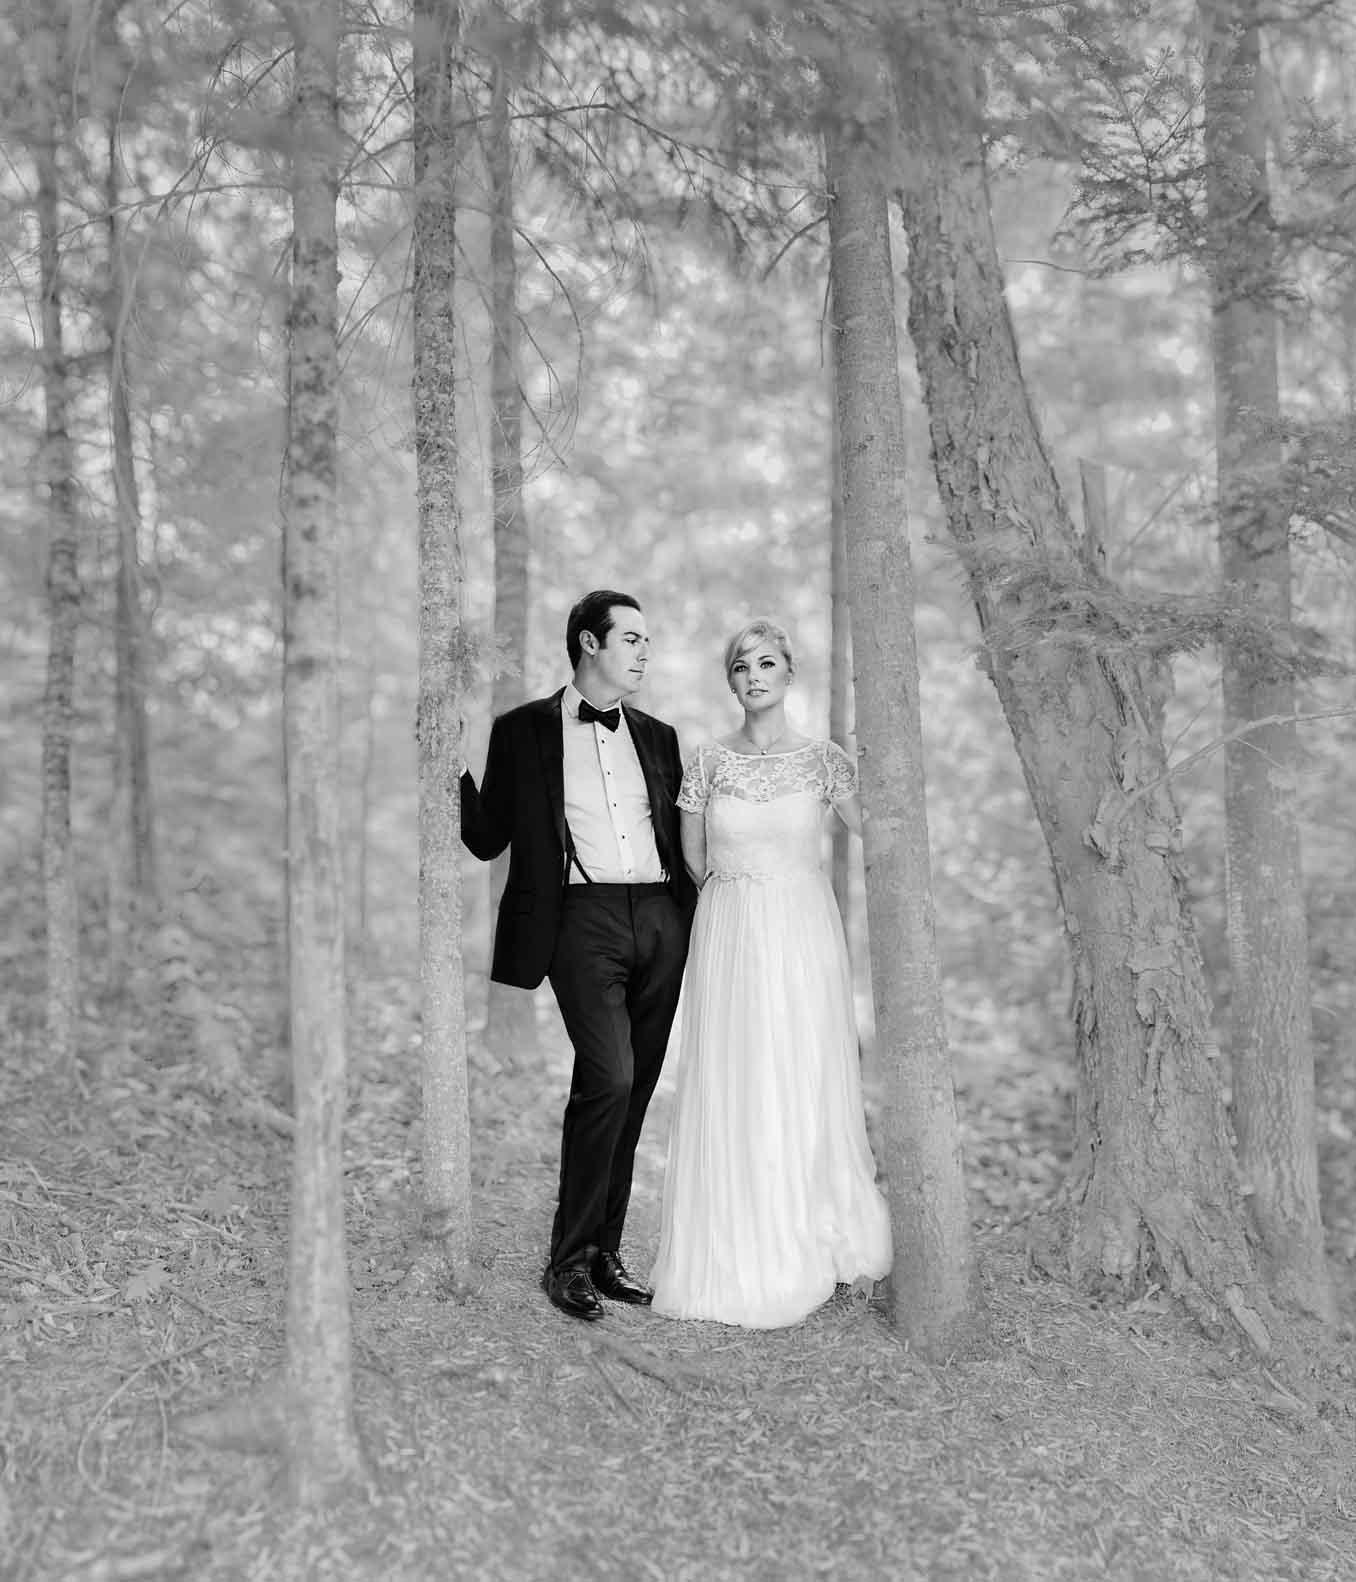 Lake-placid-wedding-2.jpg